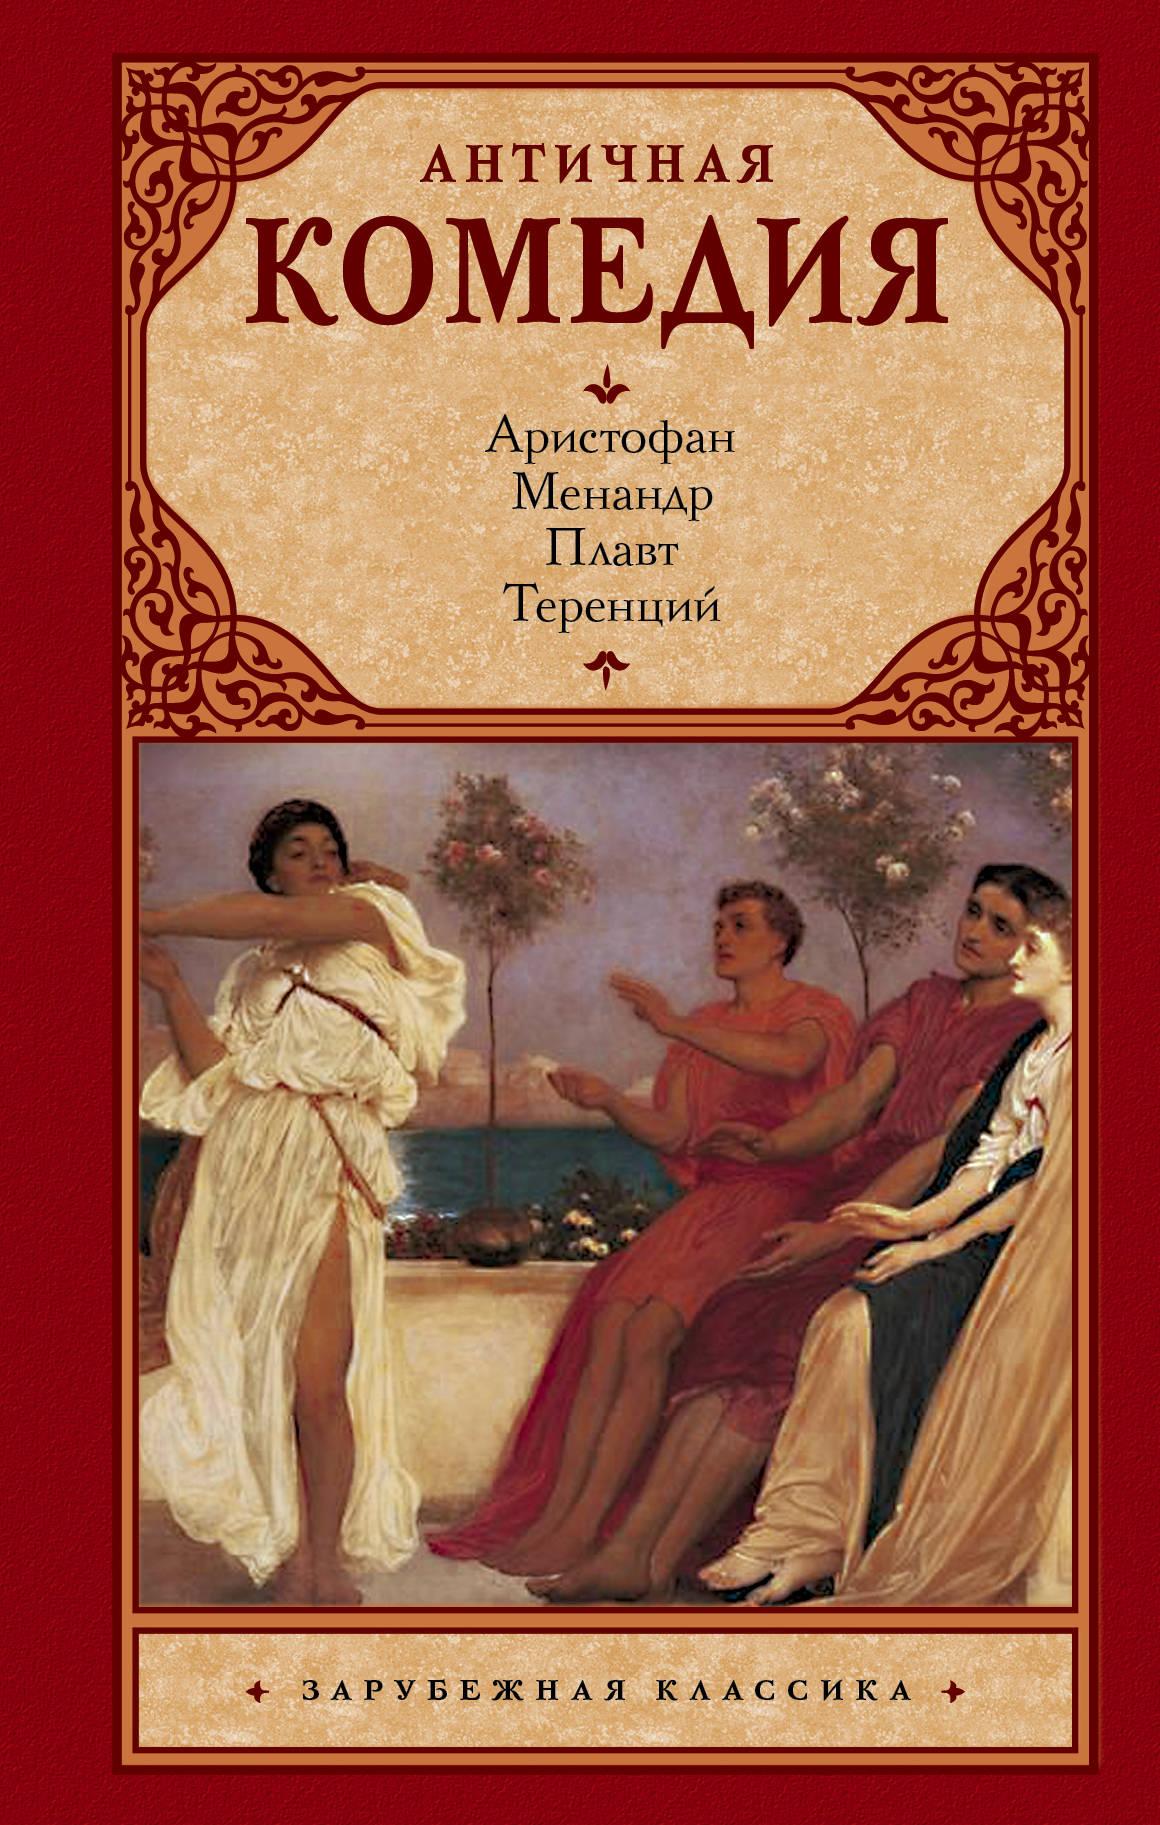 Аристофан, Плавт, Менандр, Теренций Античная комедия лисистрата